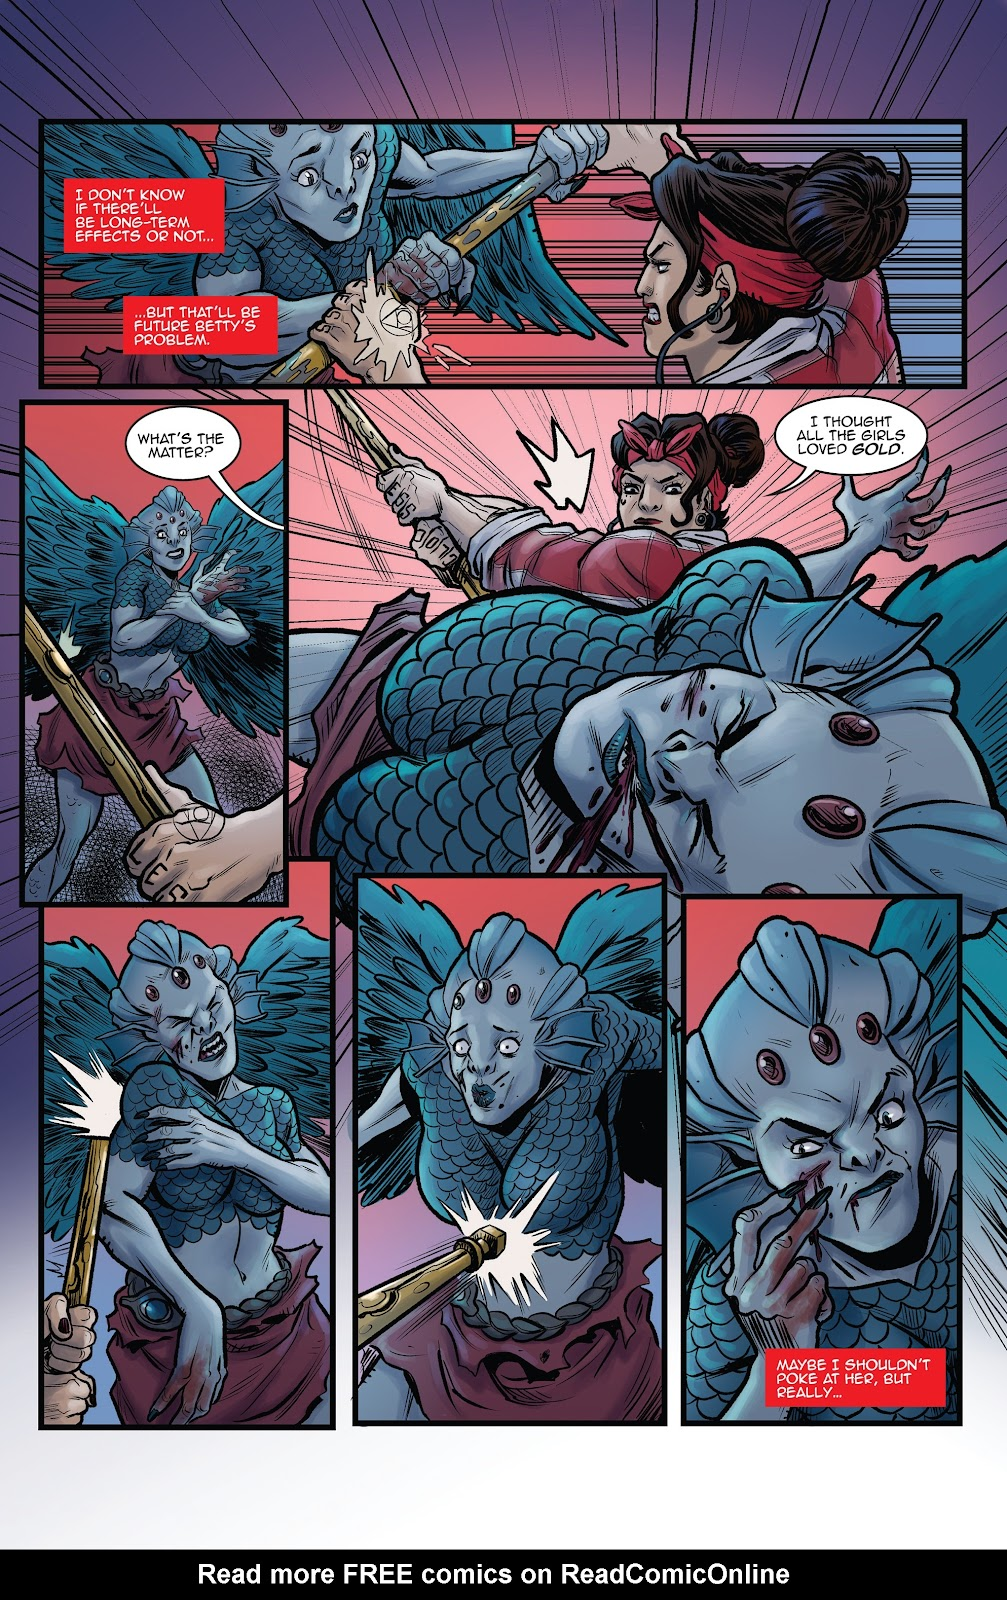 Read online Black Betty comic -  Issue #8 - 11